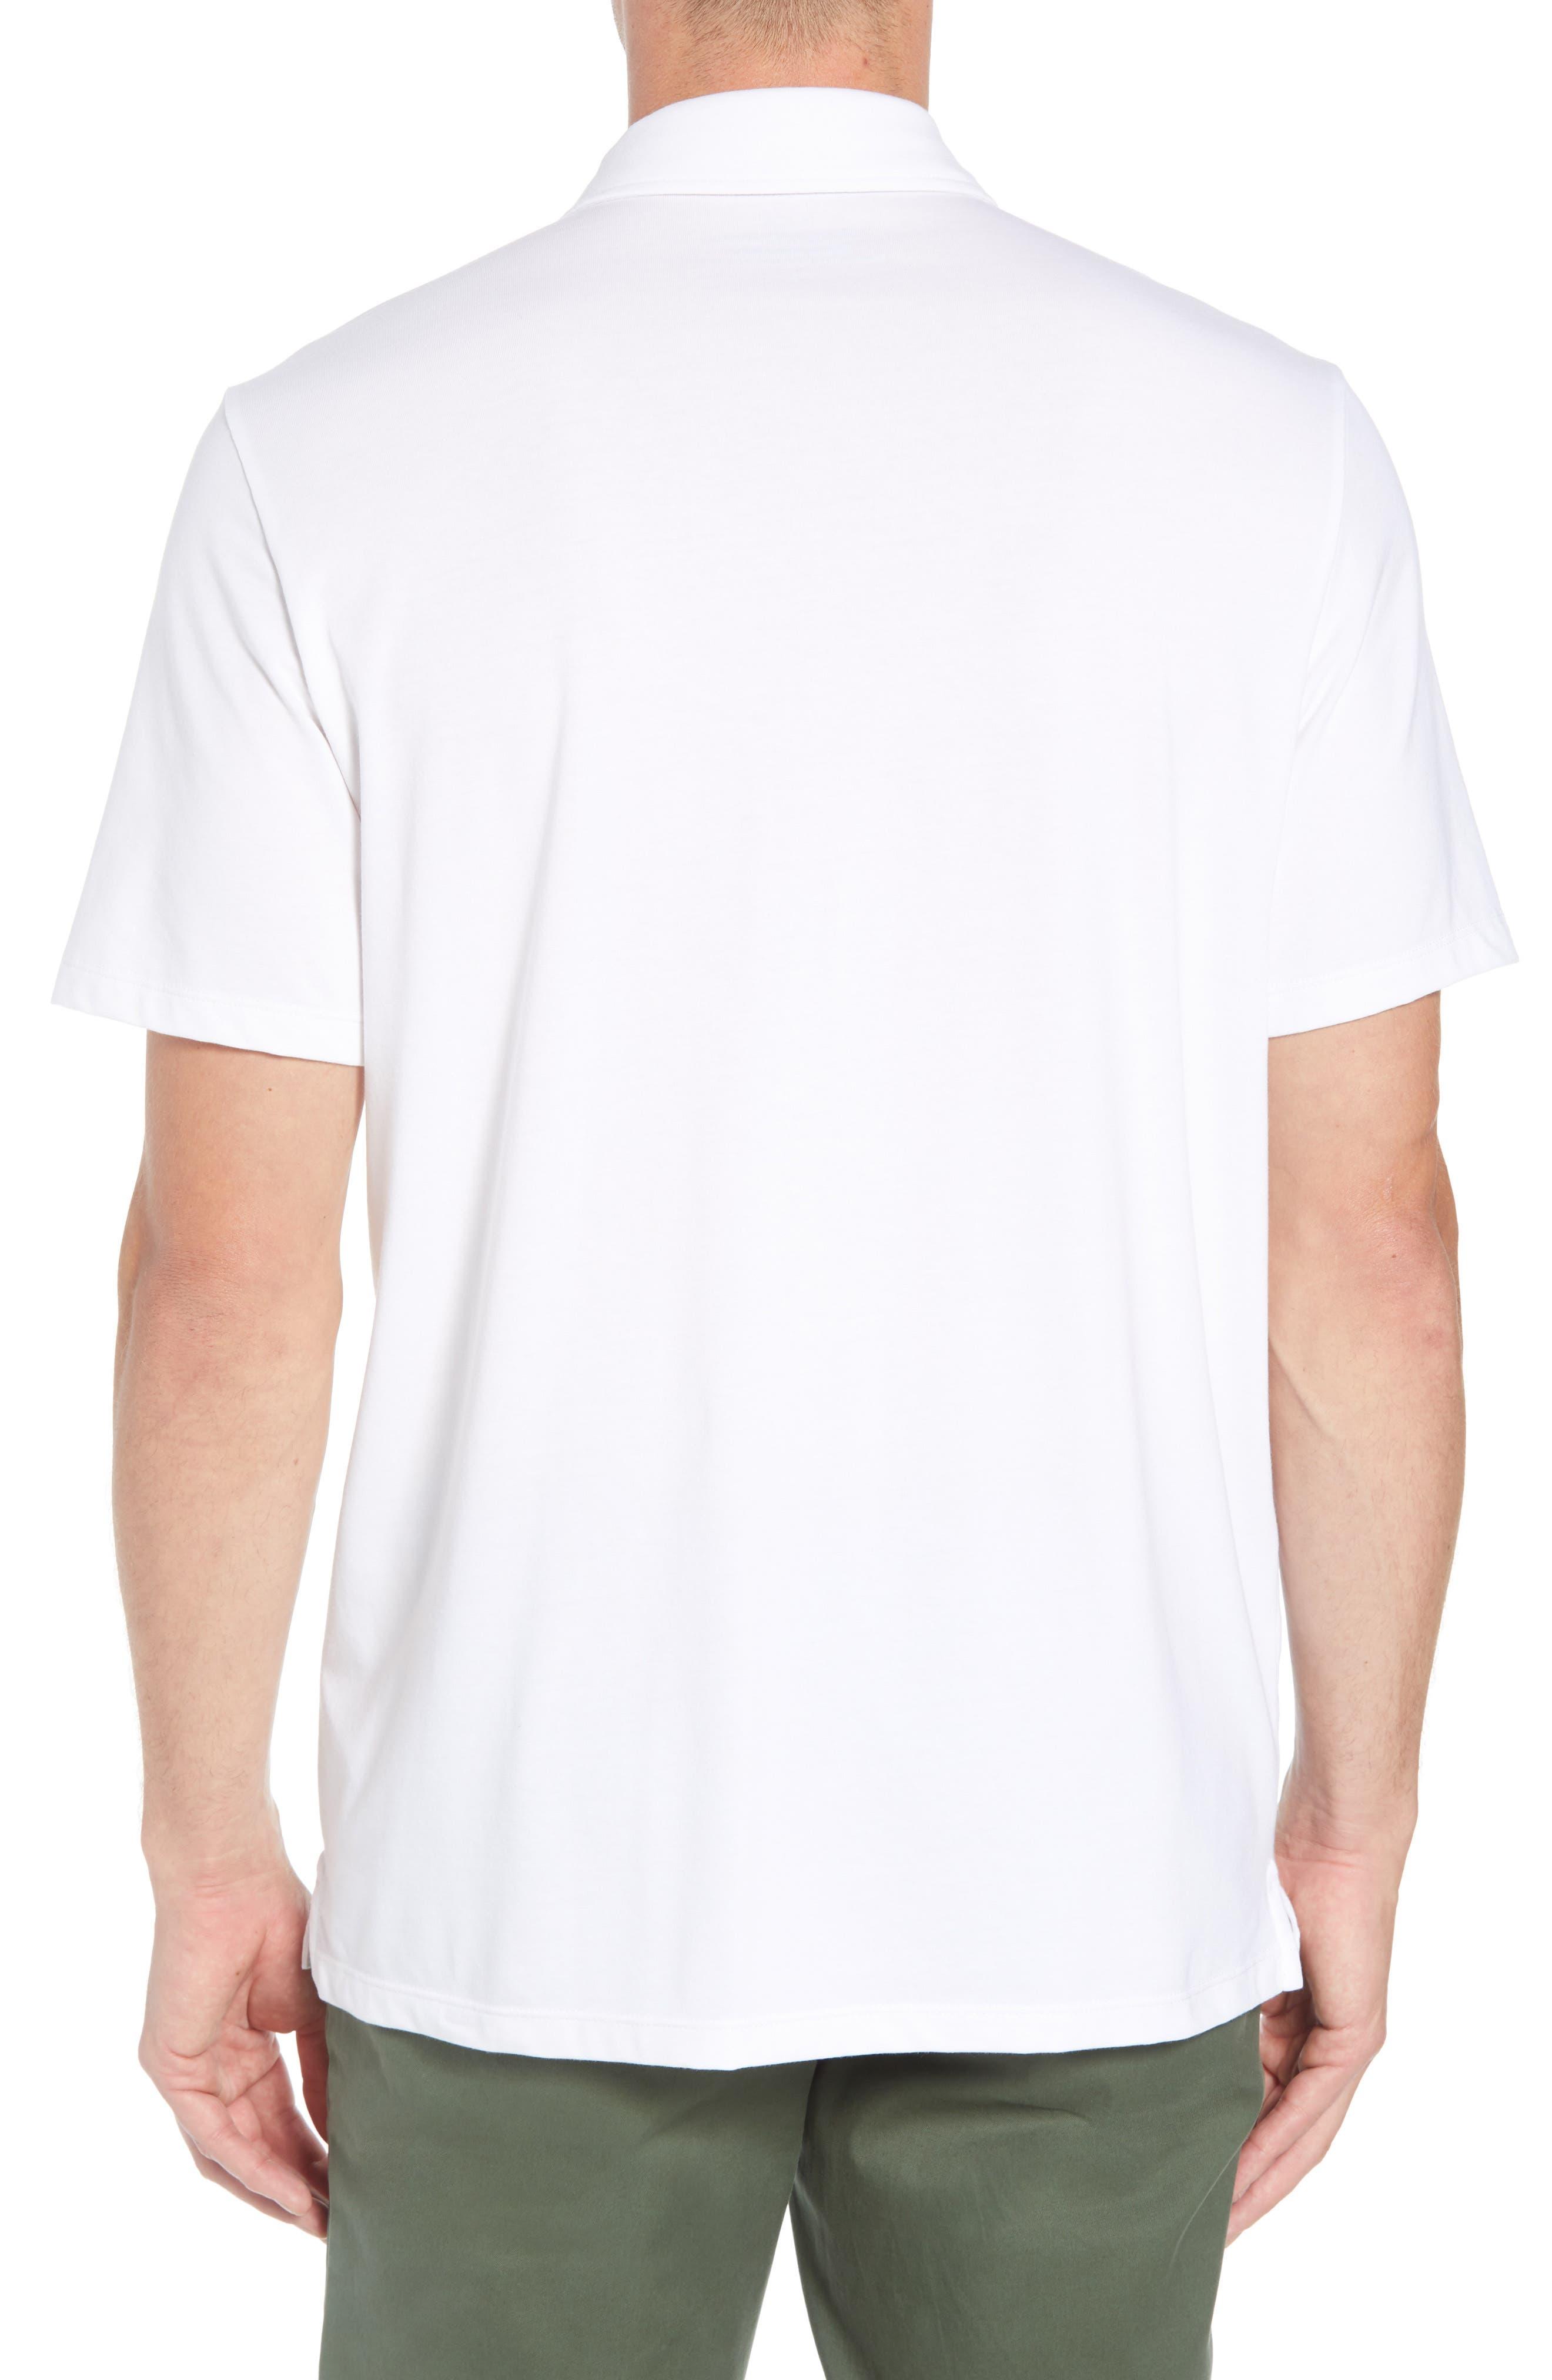 VINEYARD VINES, Edgartown Polo Shirt, Alternate thumbnail 2, color, WHITE CAP